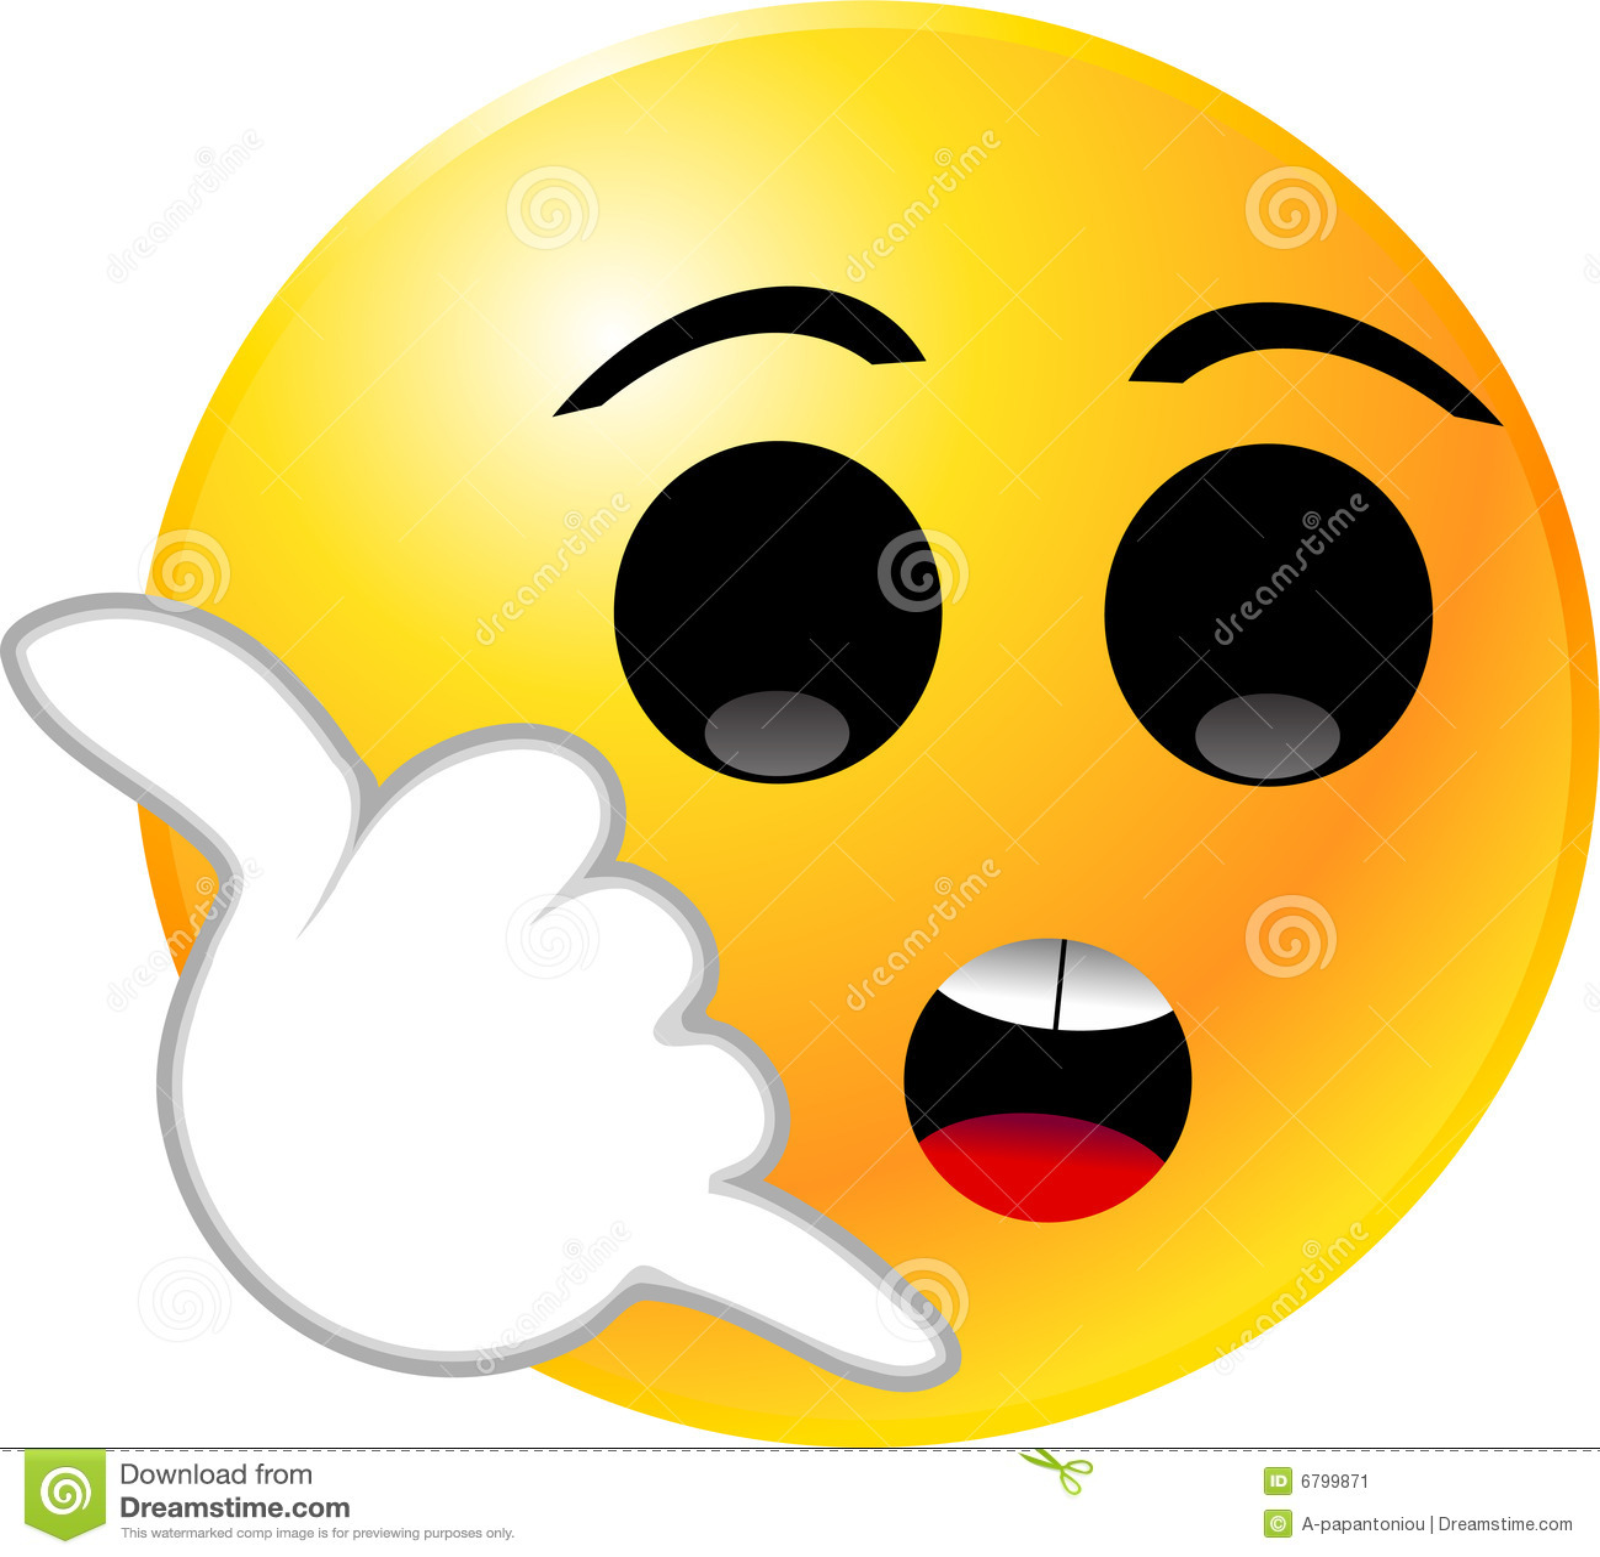 Vector clip art illustration of an emoticon smiley face icon.